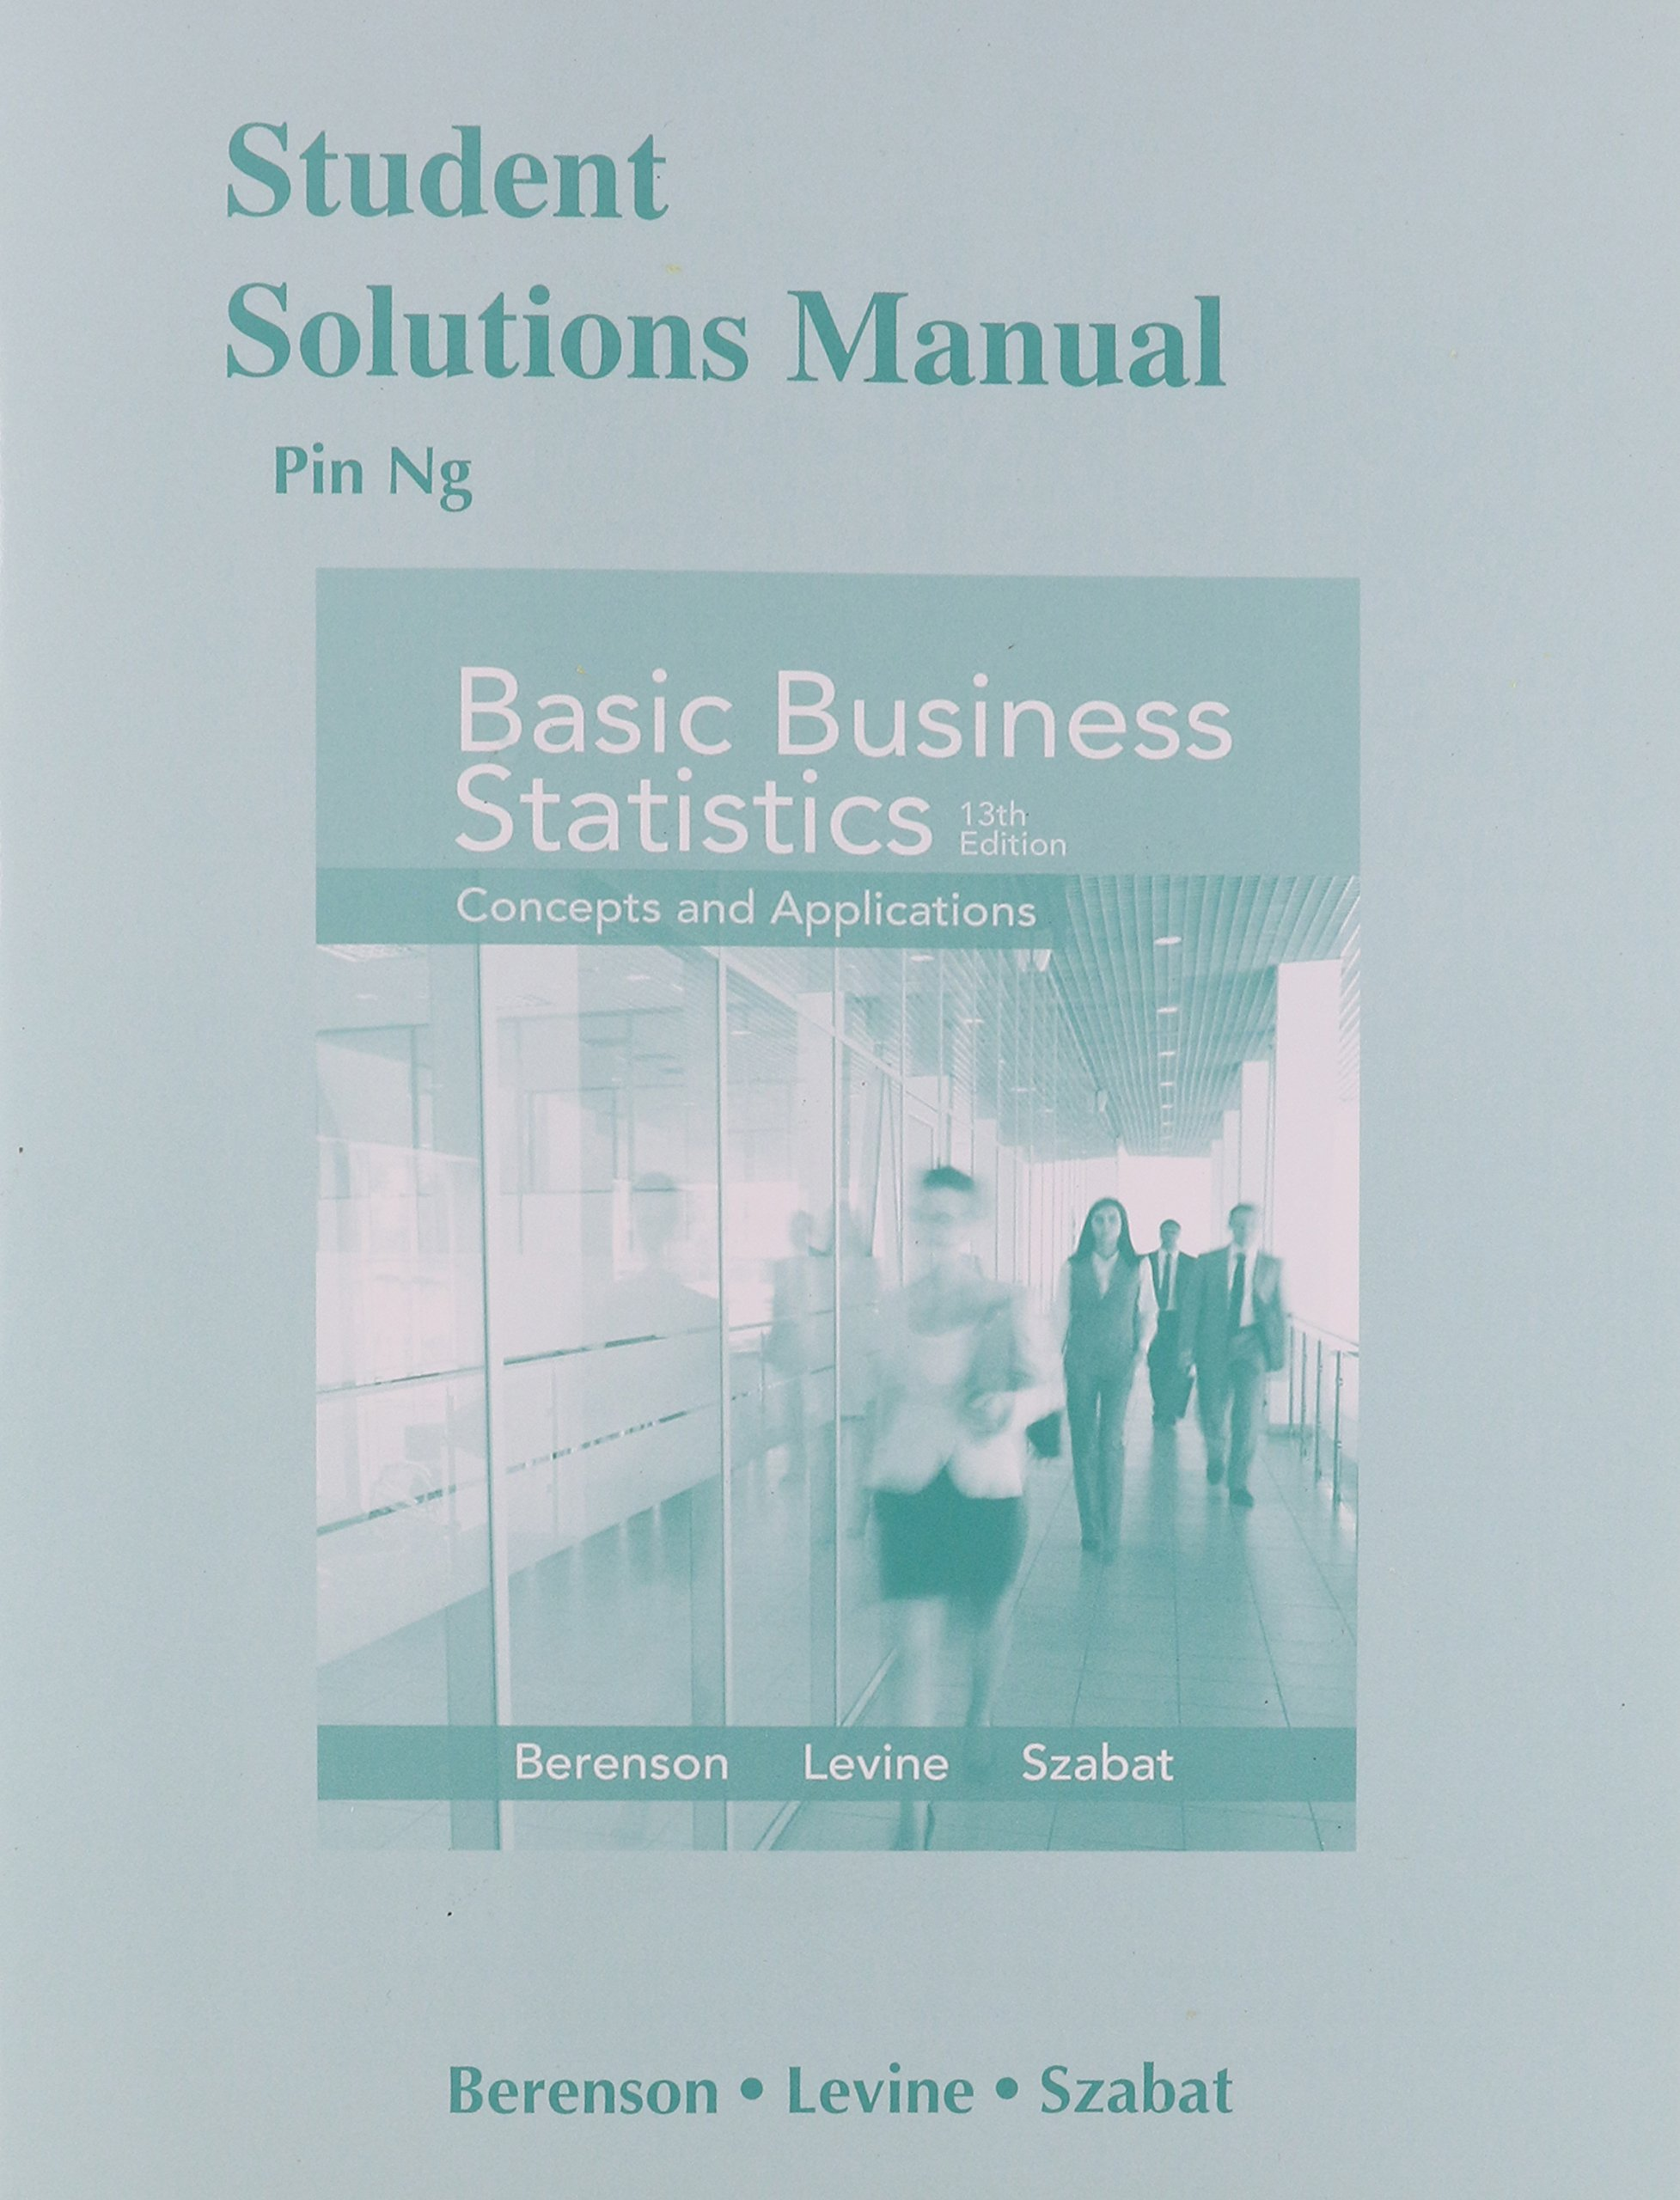 Student Solutions Manual for Basic Business Statistics: Mark L. Berenson,  David M. Levine, Kathryn A. Szabat: 9780321926708: Statistics: Amazon Canada